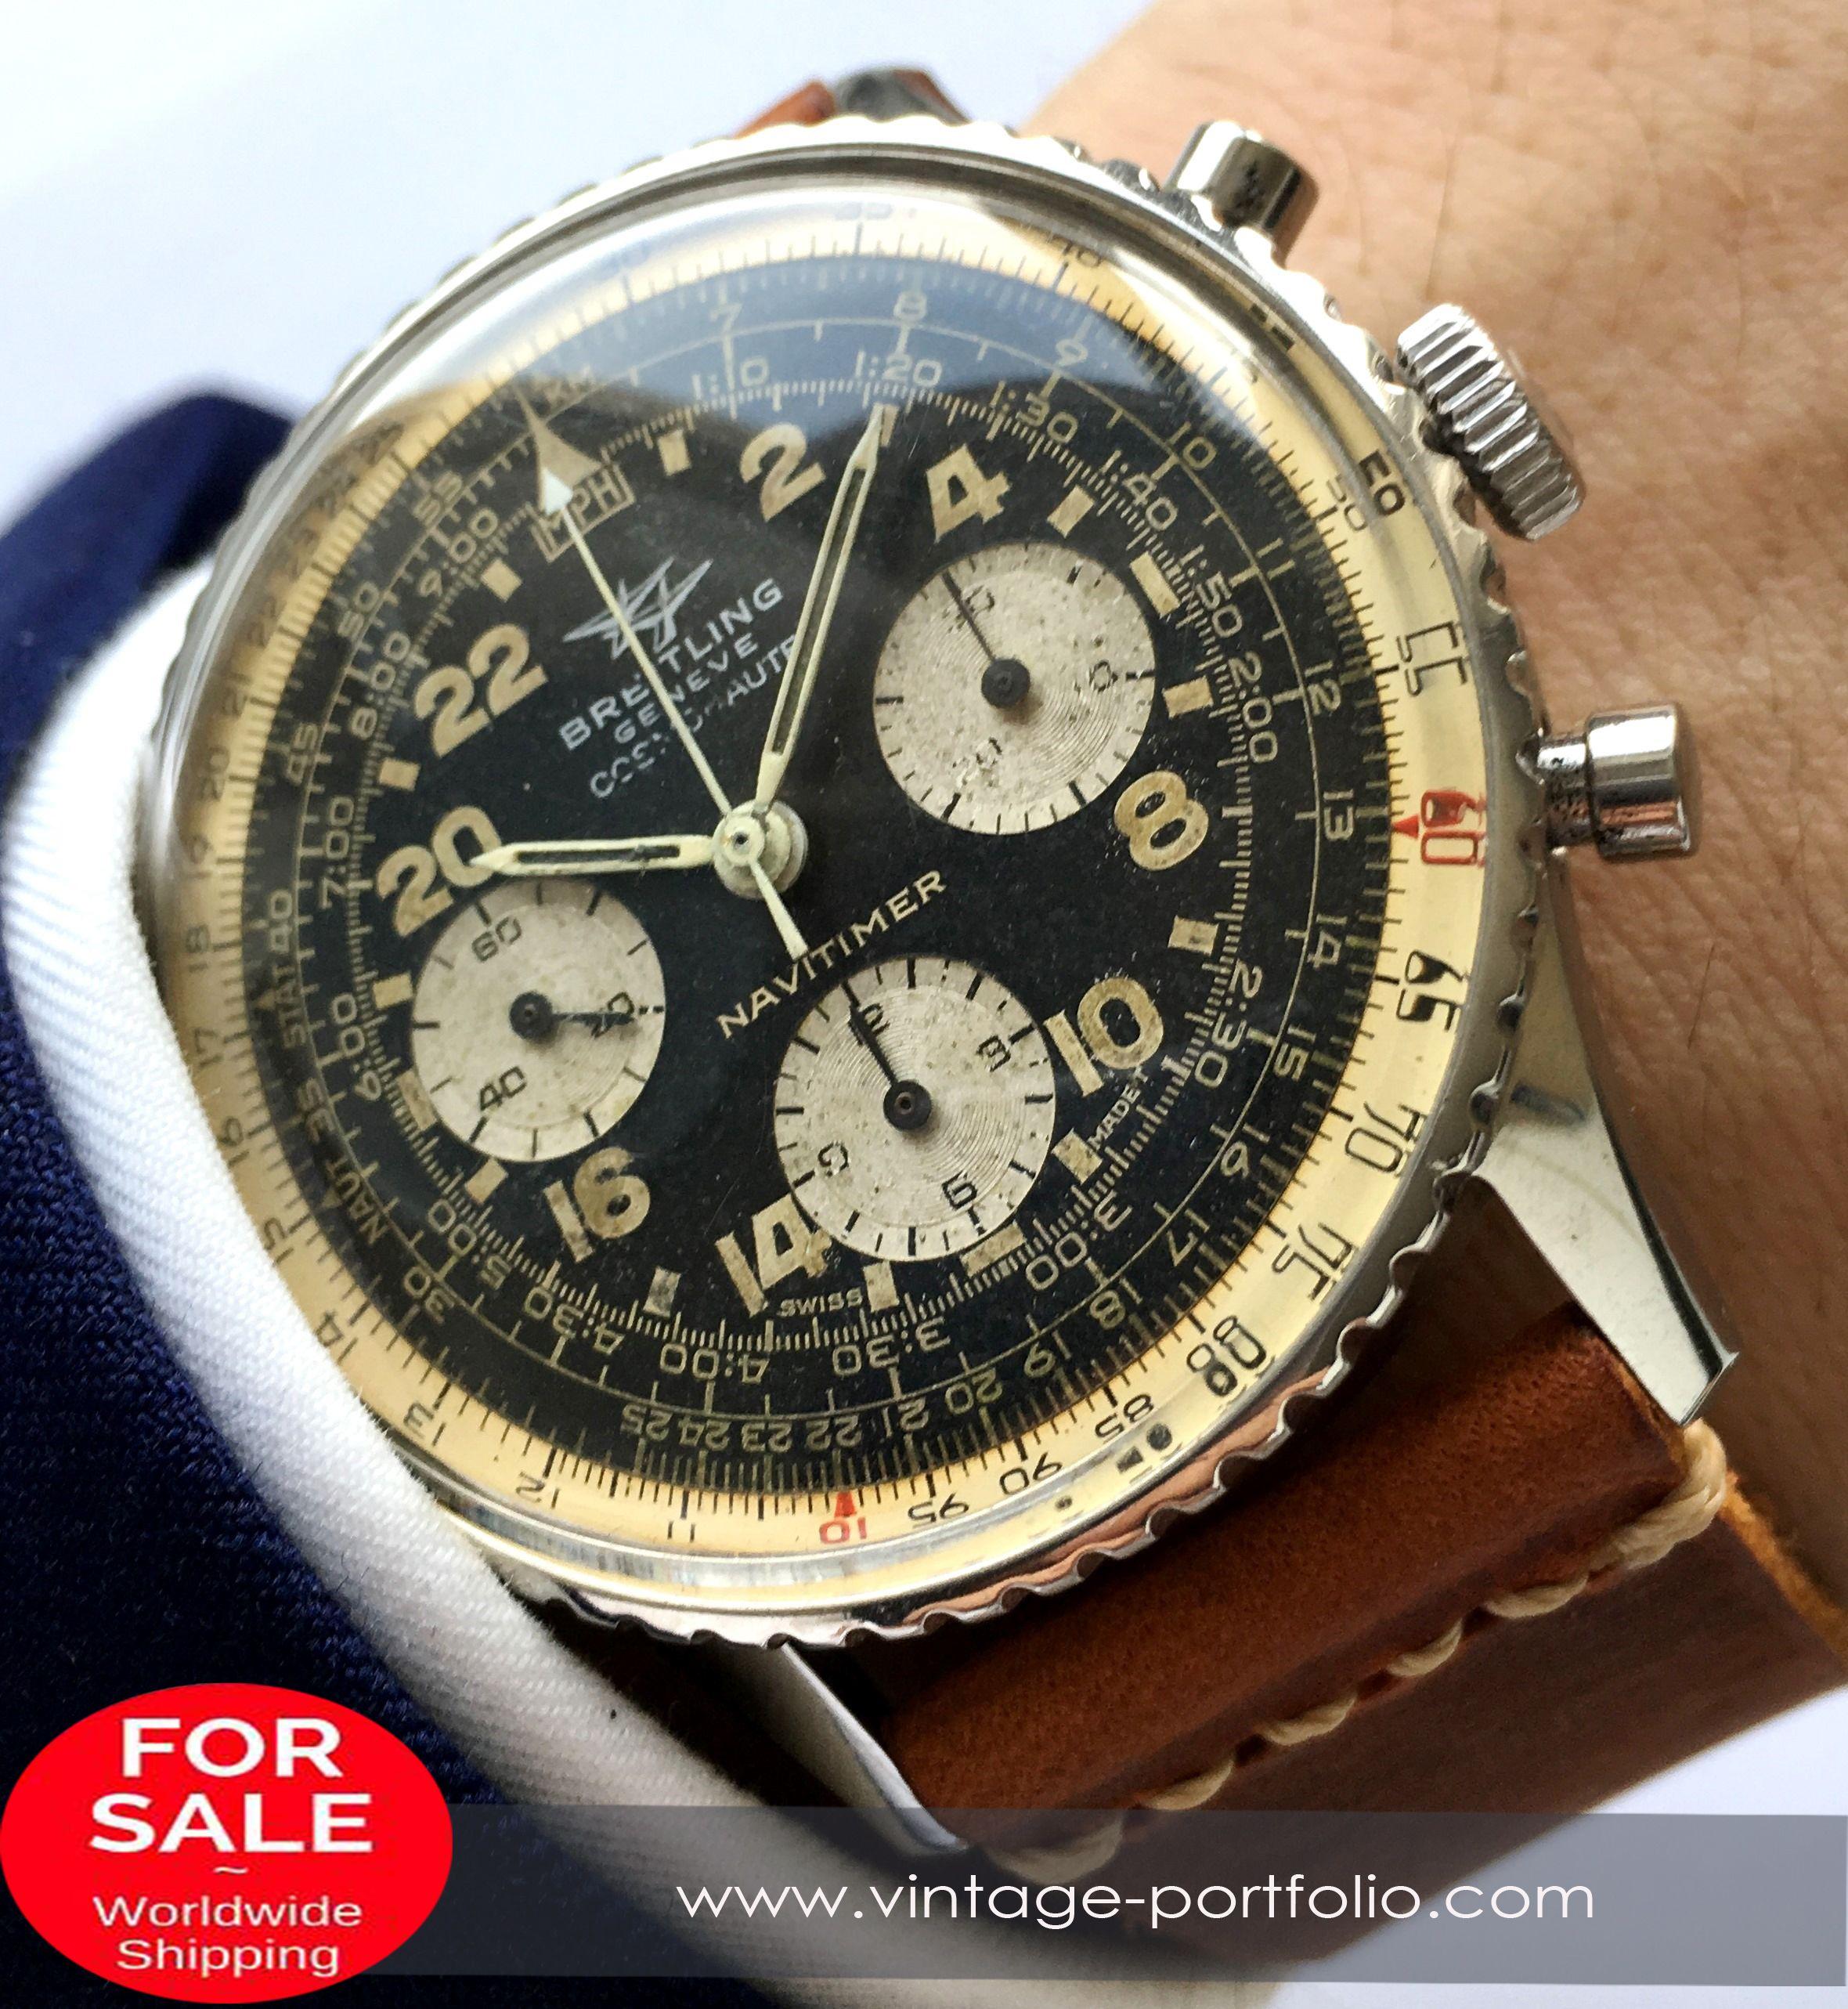 9836939426d Original Breitling Old Navitimer Cosmonaute ref 809 Vintage  breitling   breitlingwatches  luxurywatchbrand  militarywatches